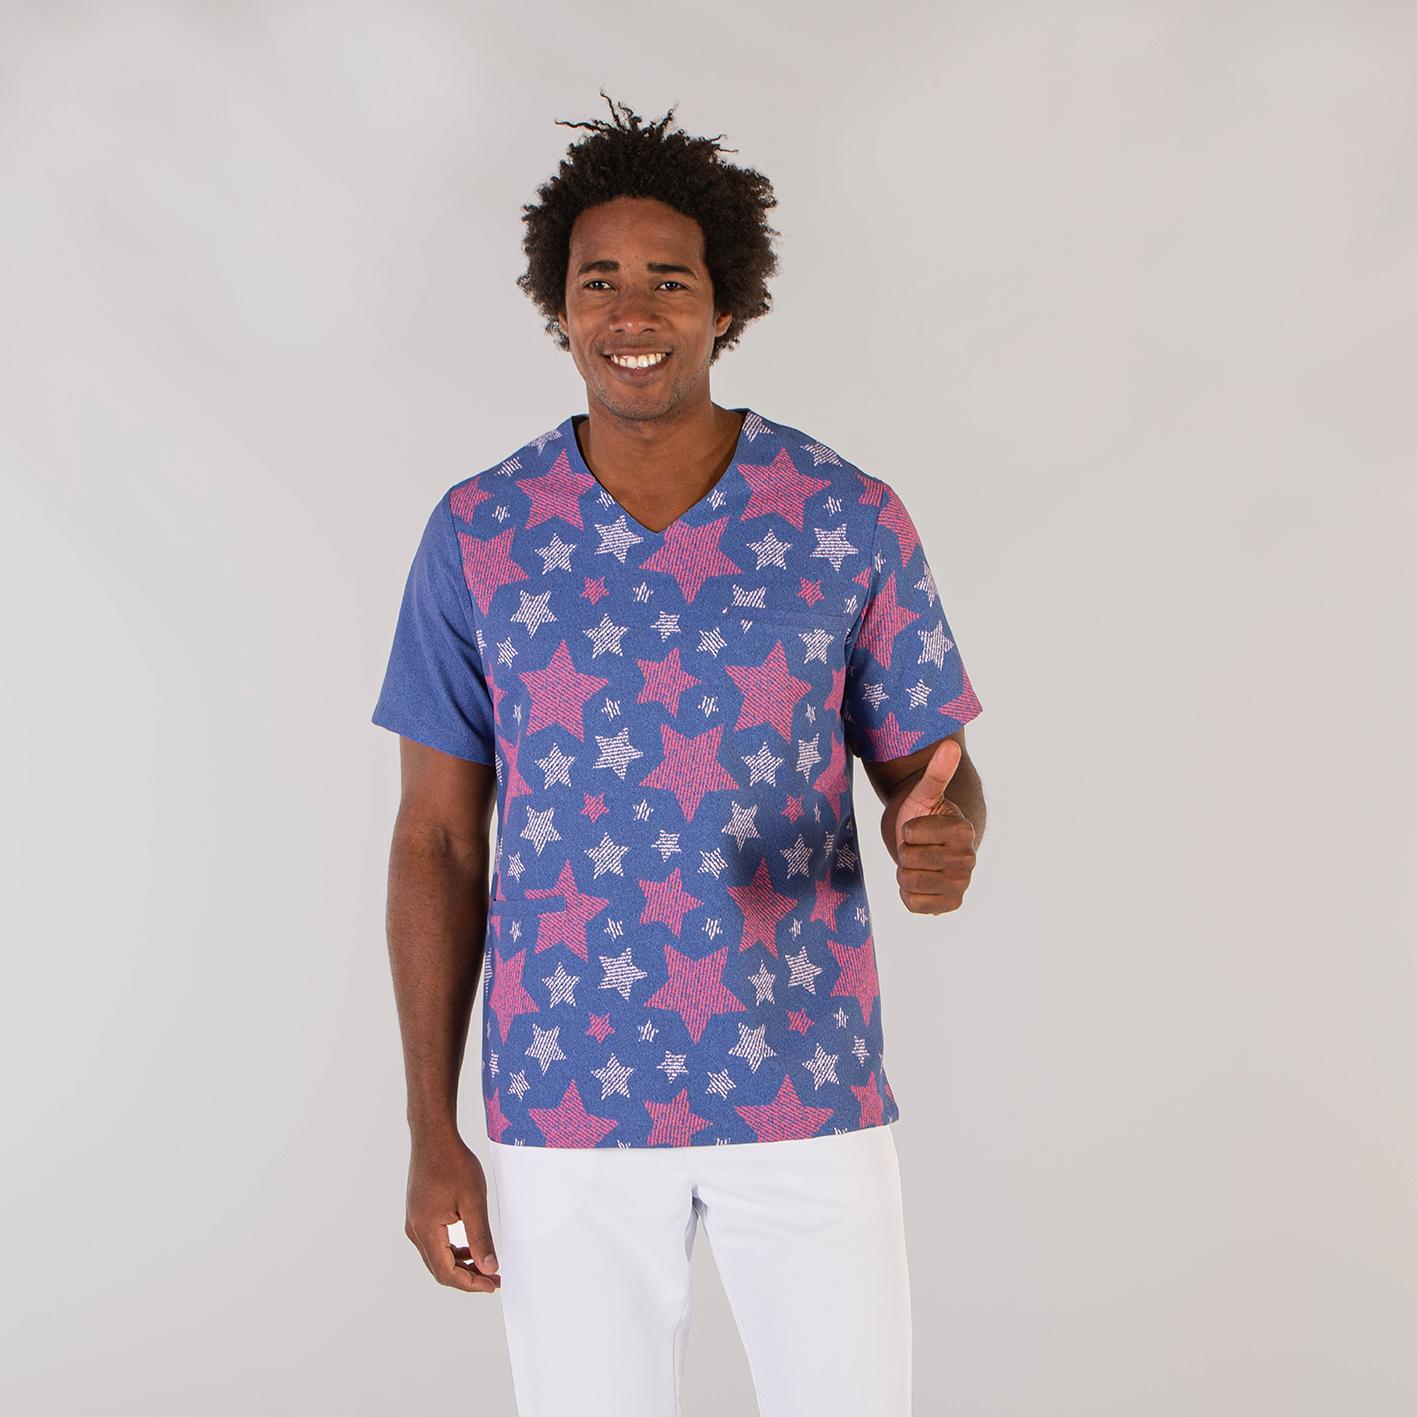 Blusa Estampada Unisex Estrellas